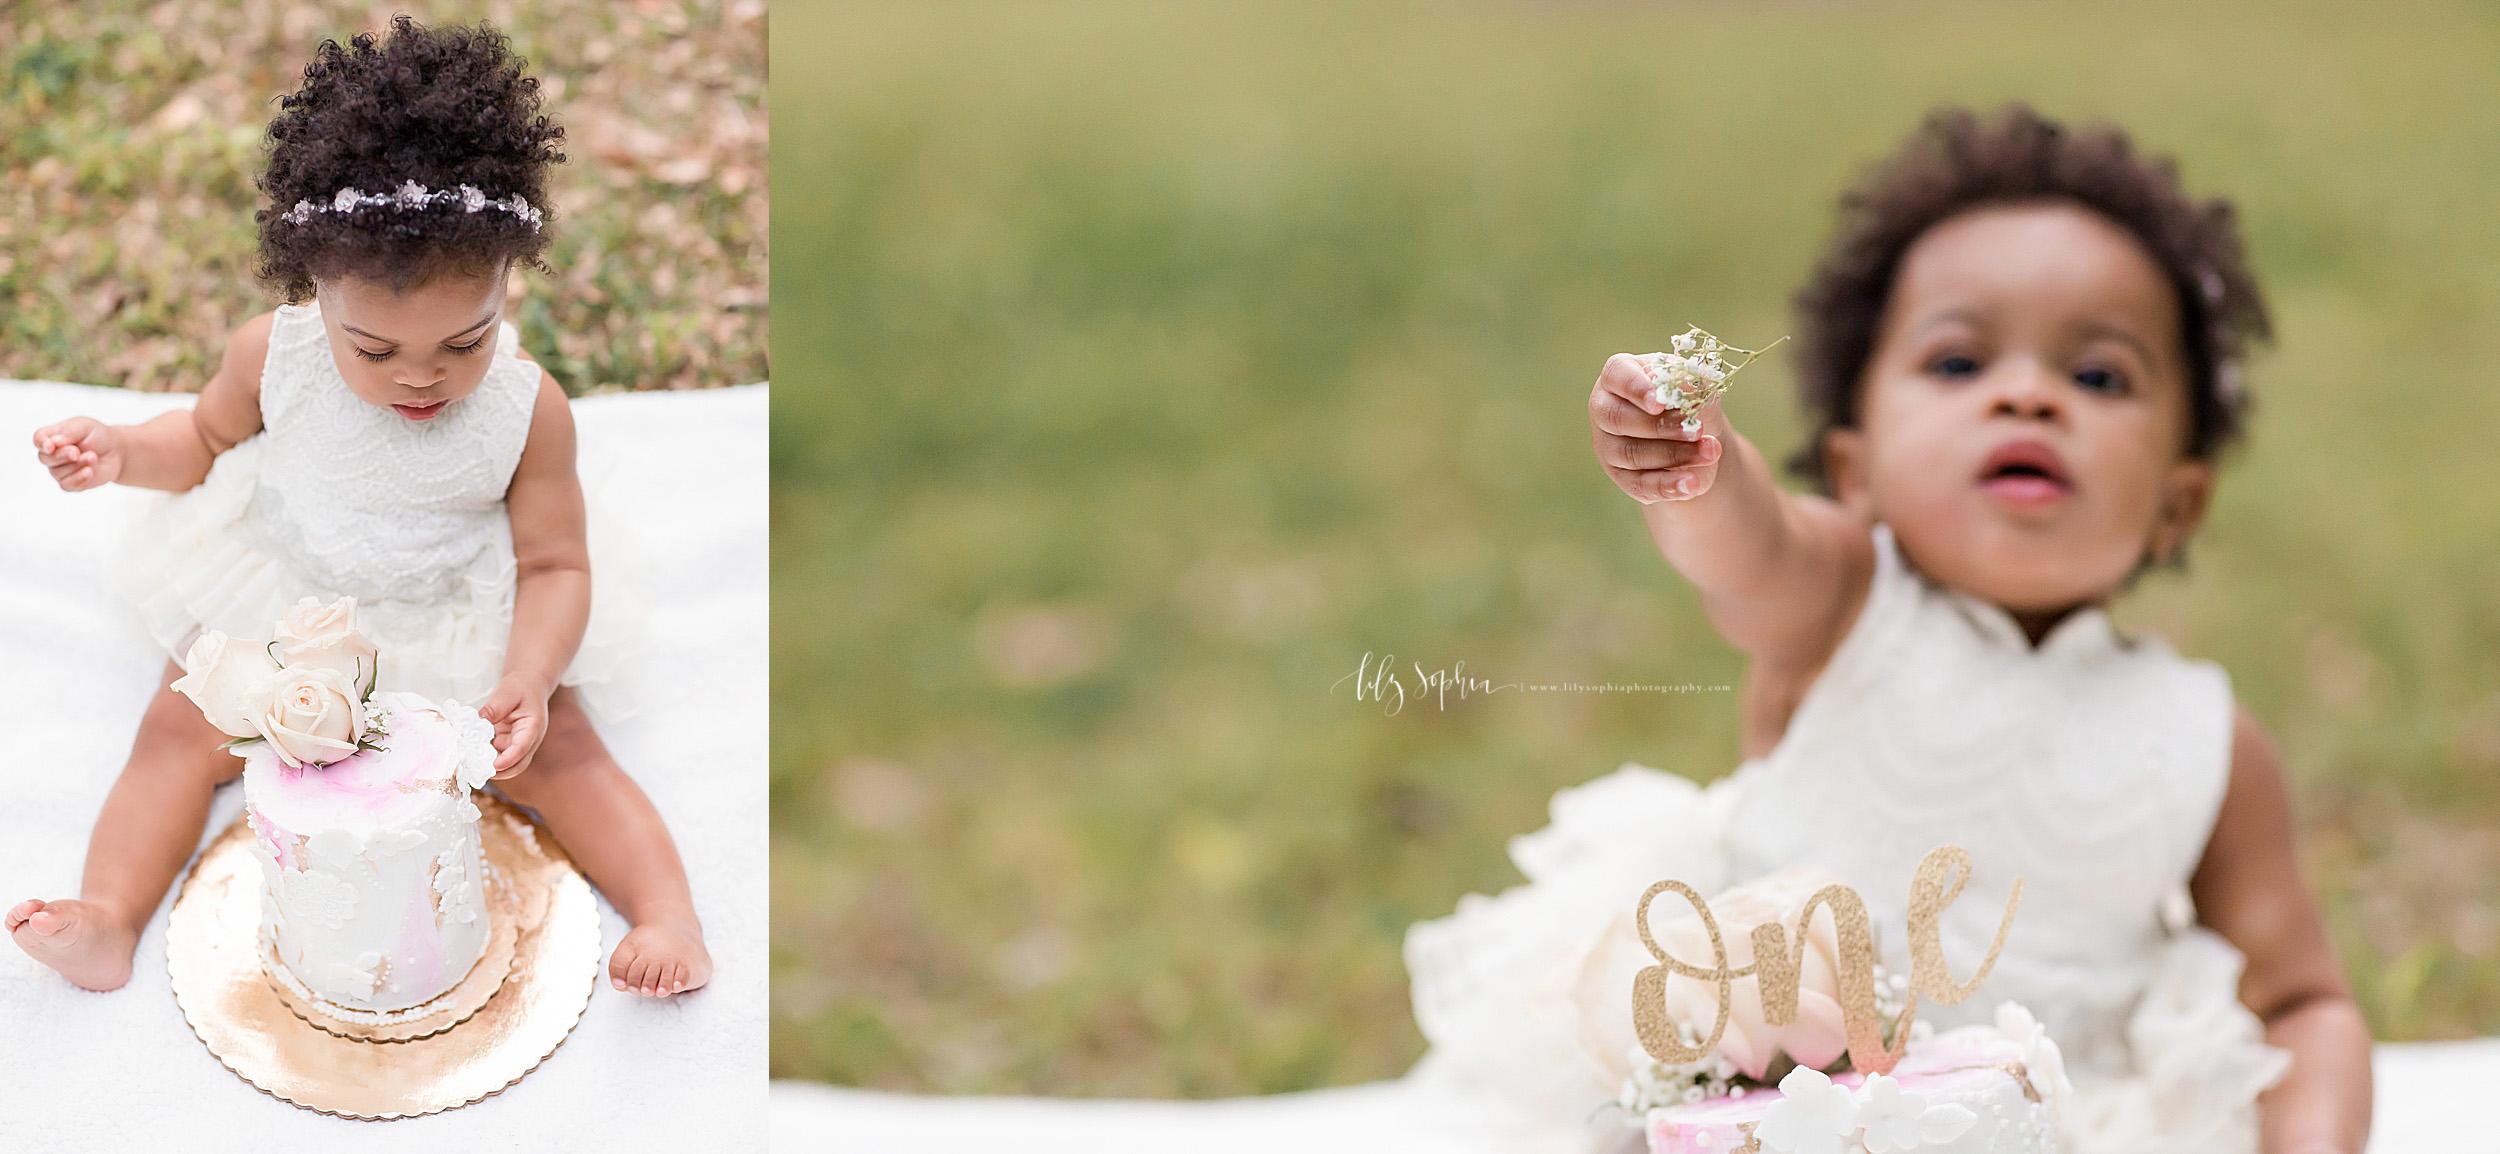 atlanta-woodstock-alpharetta-sandy-springs-buckhead-virginia-highlands-west-end-decatur-lily-sophia-photography-outdoor-park-sunset-first-birthday-cake-smash-toddler-baby-girl-family-photos_1123.jpg